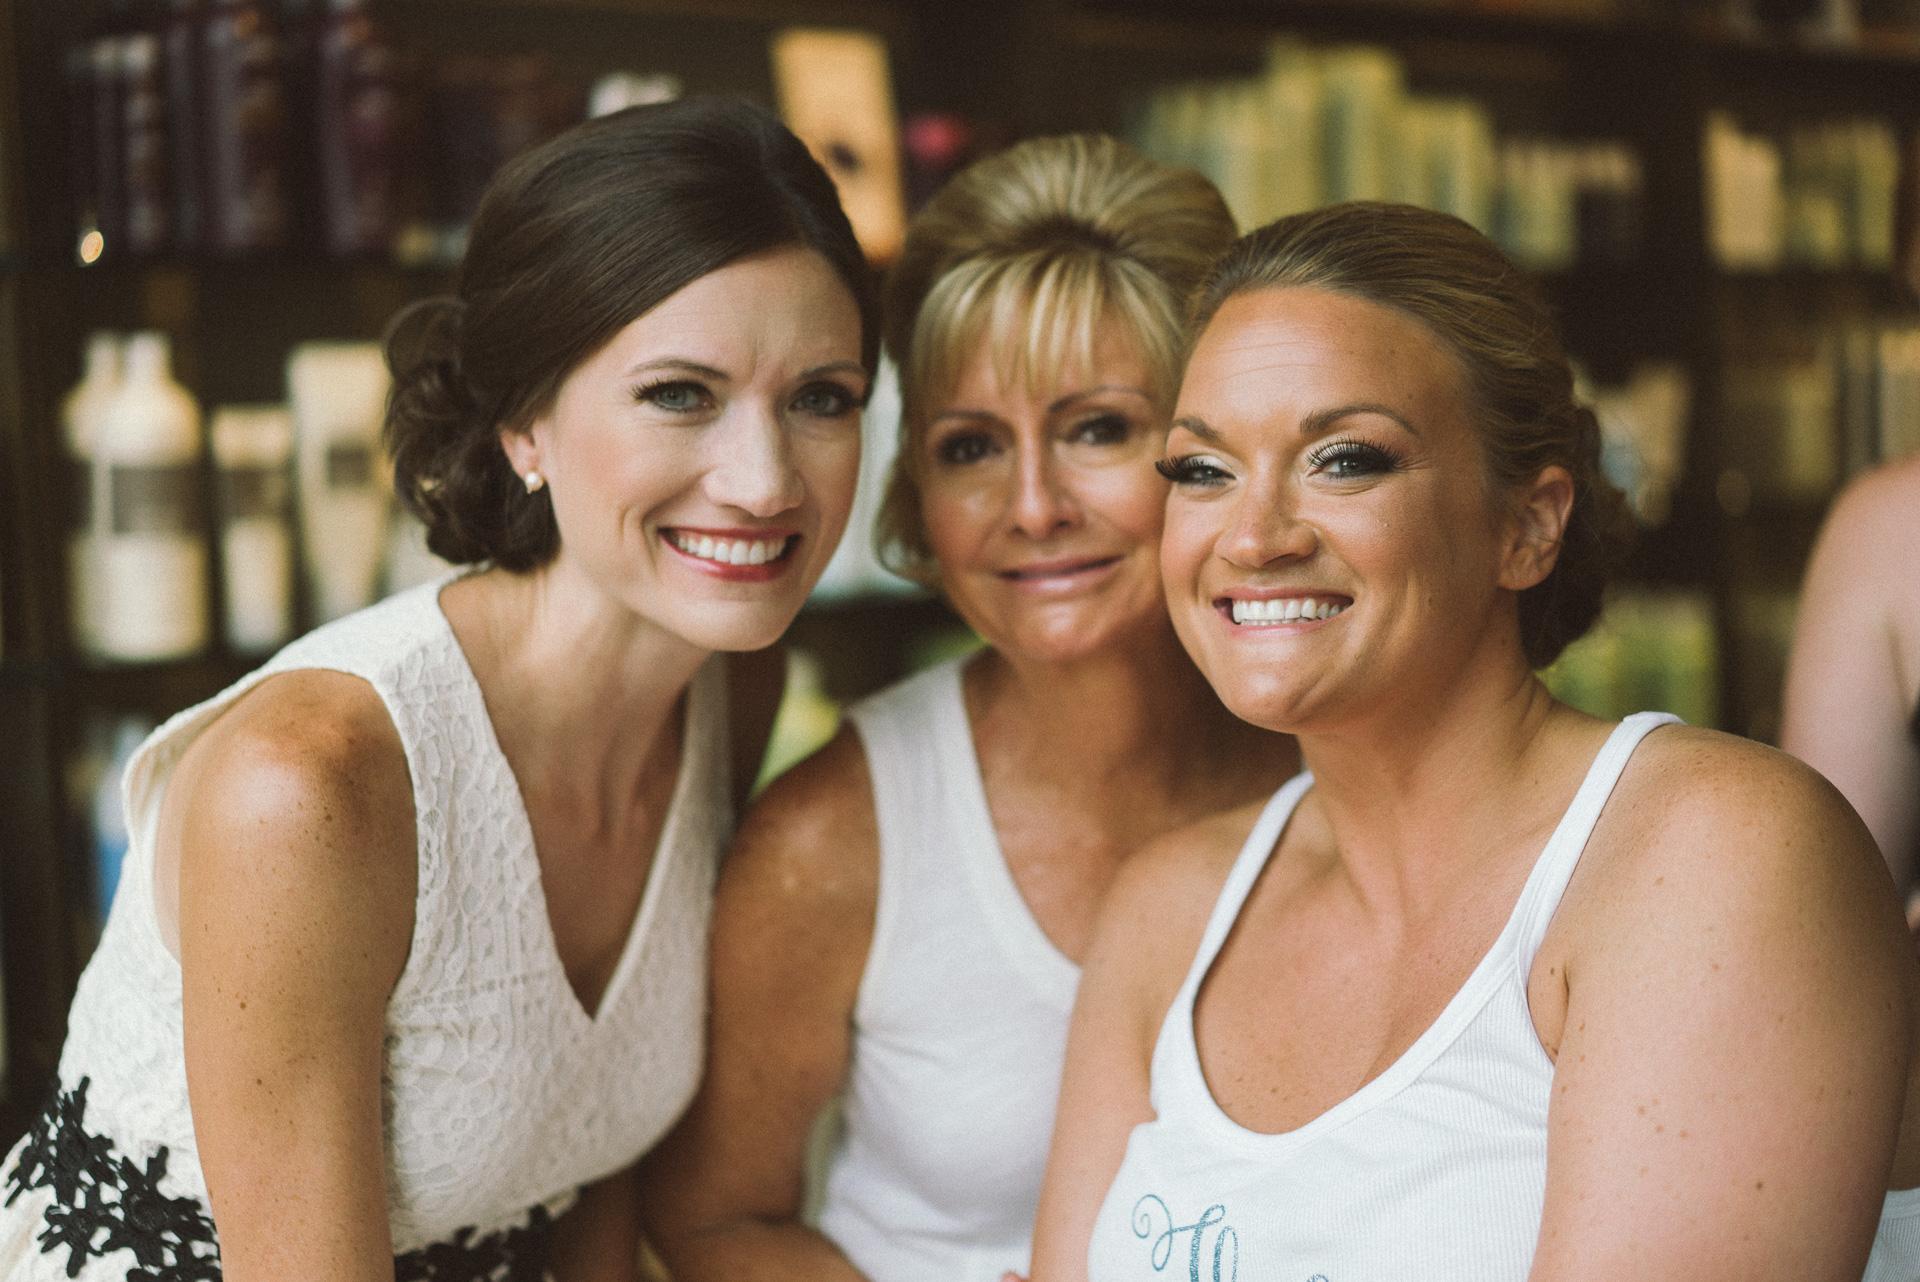 Dayton Wedding Photographer - Girls Photo